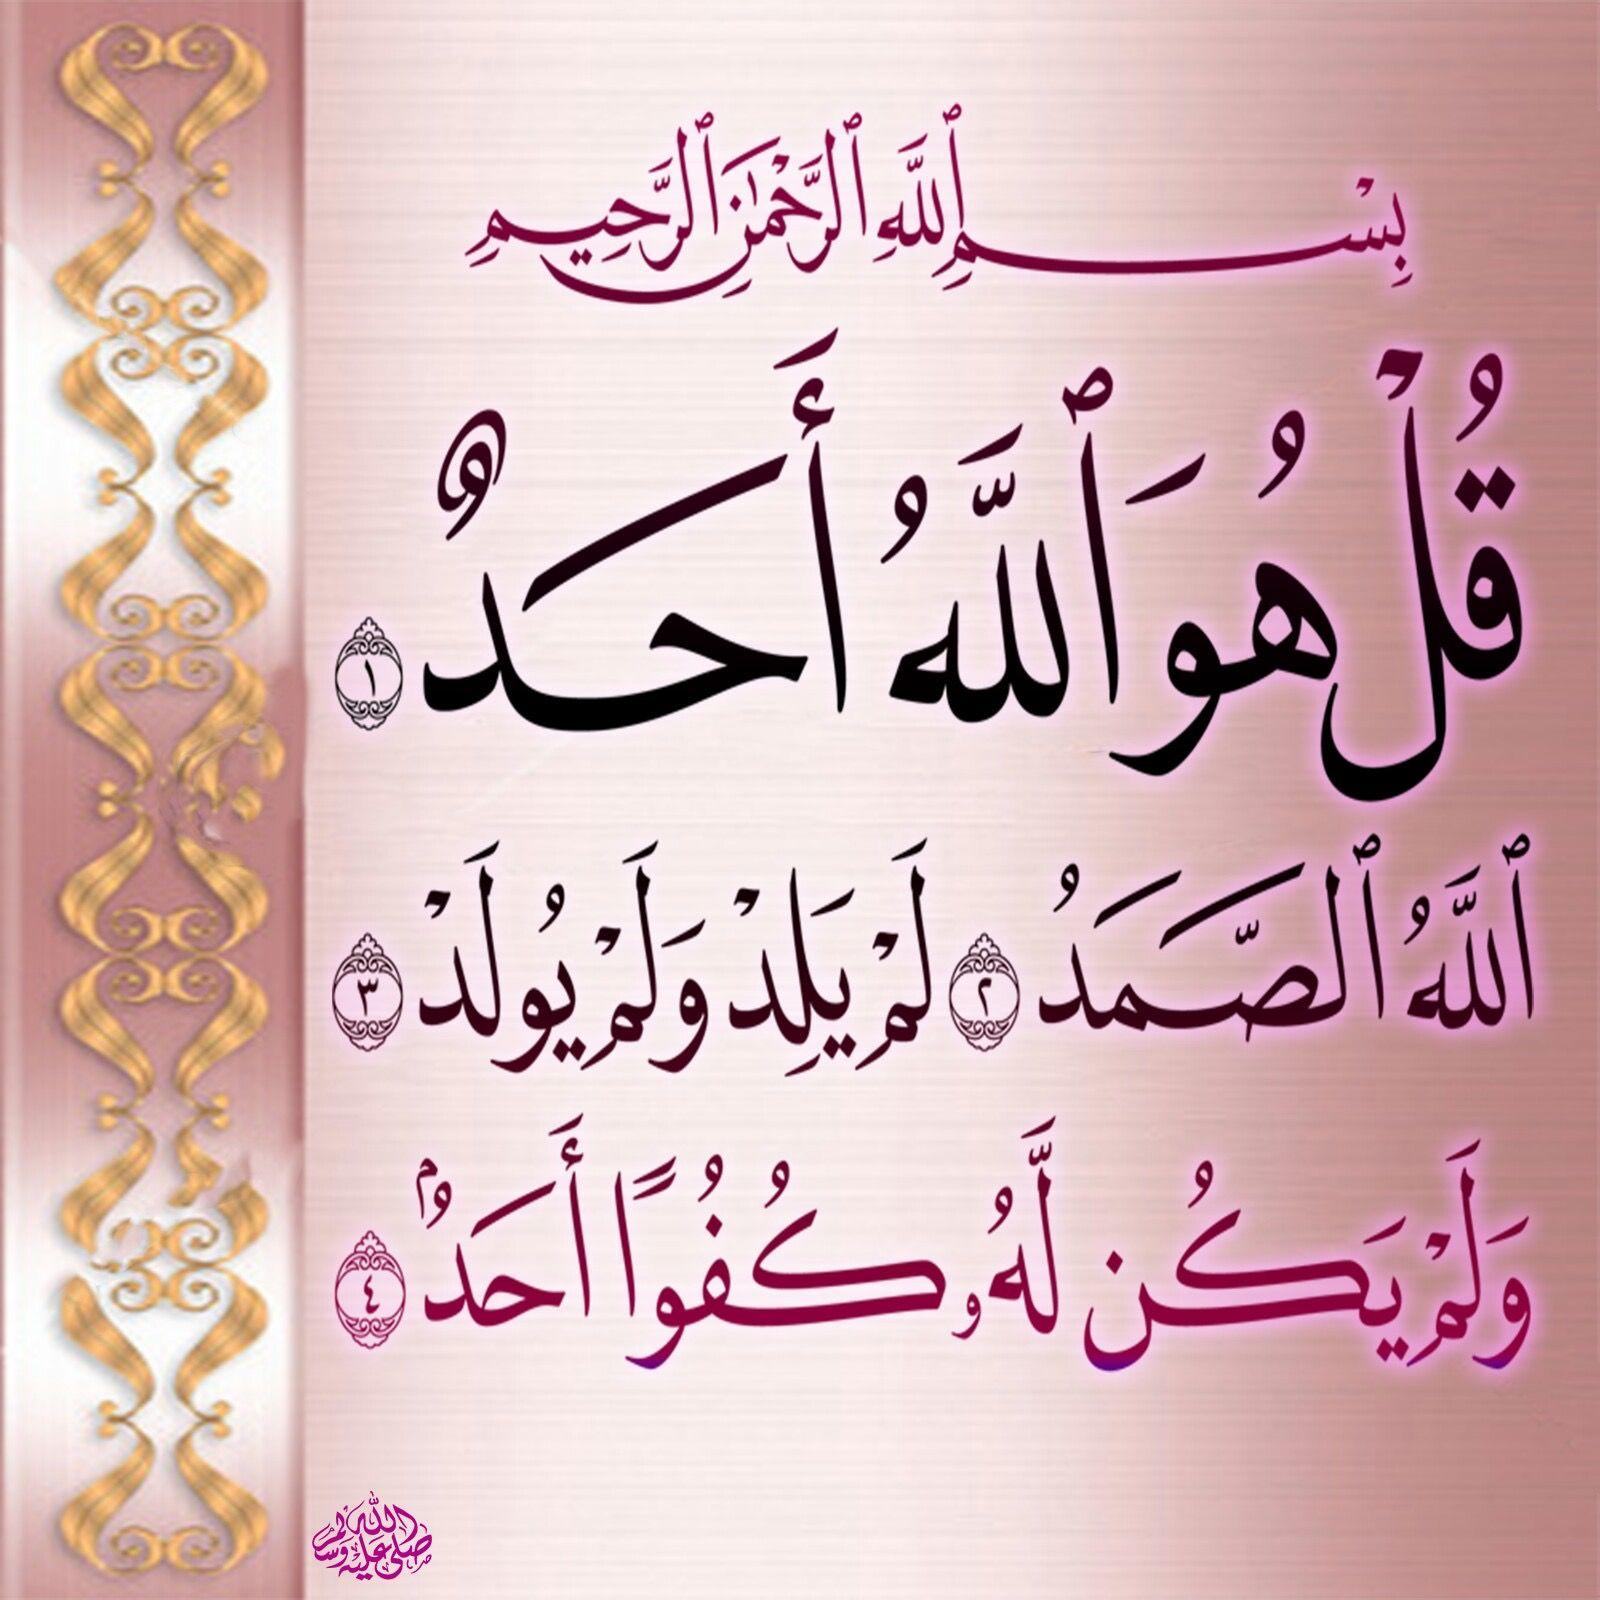 سورة الإخلاص Arabic Calligraphy Calligraphy Art